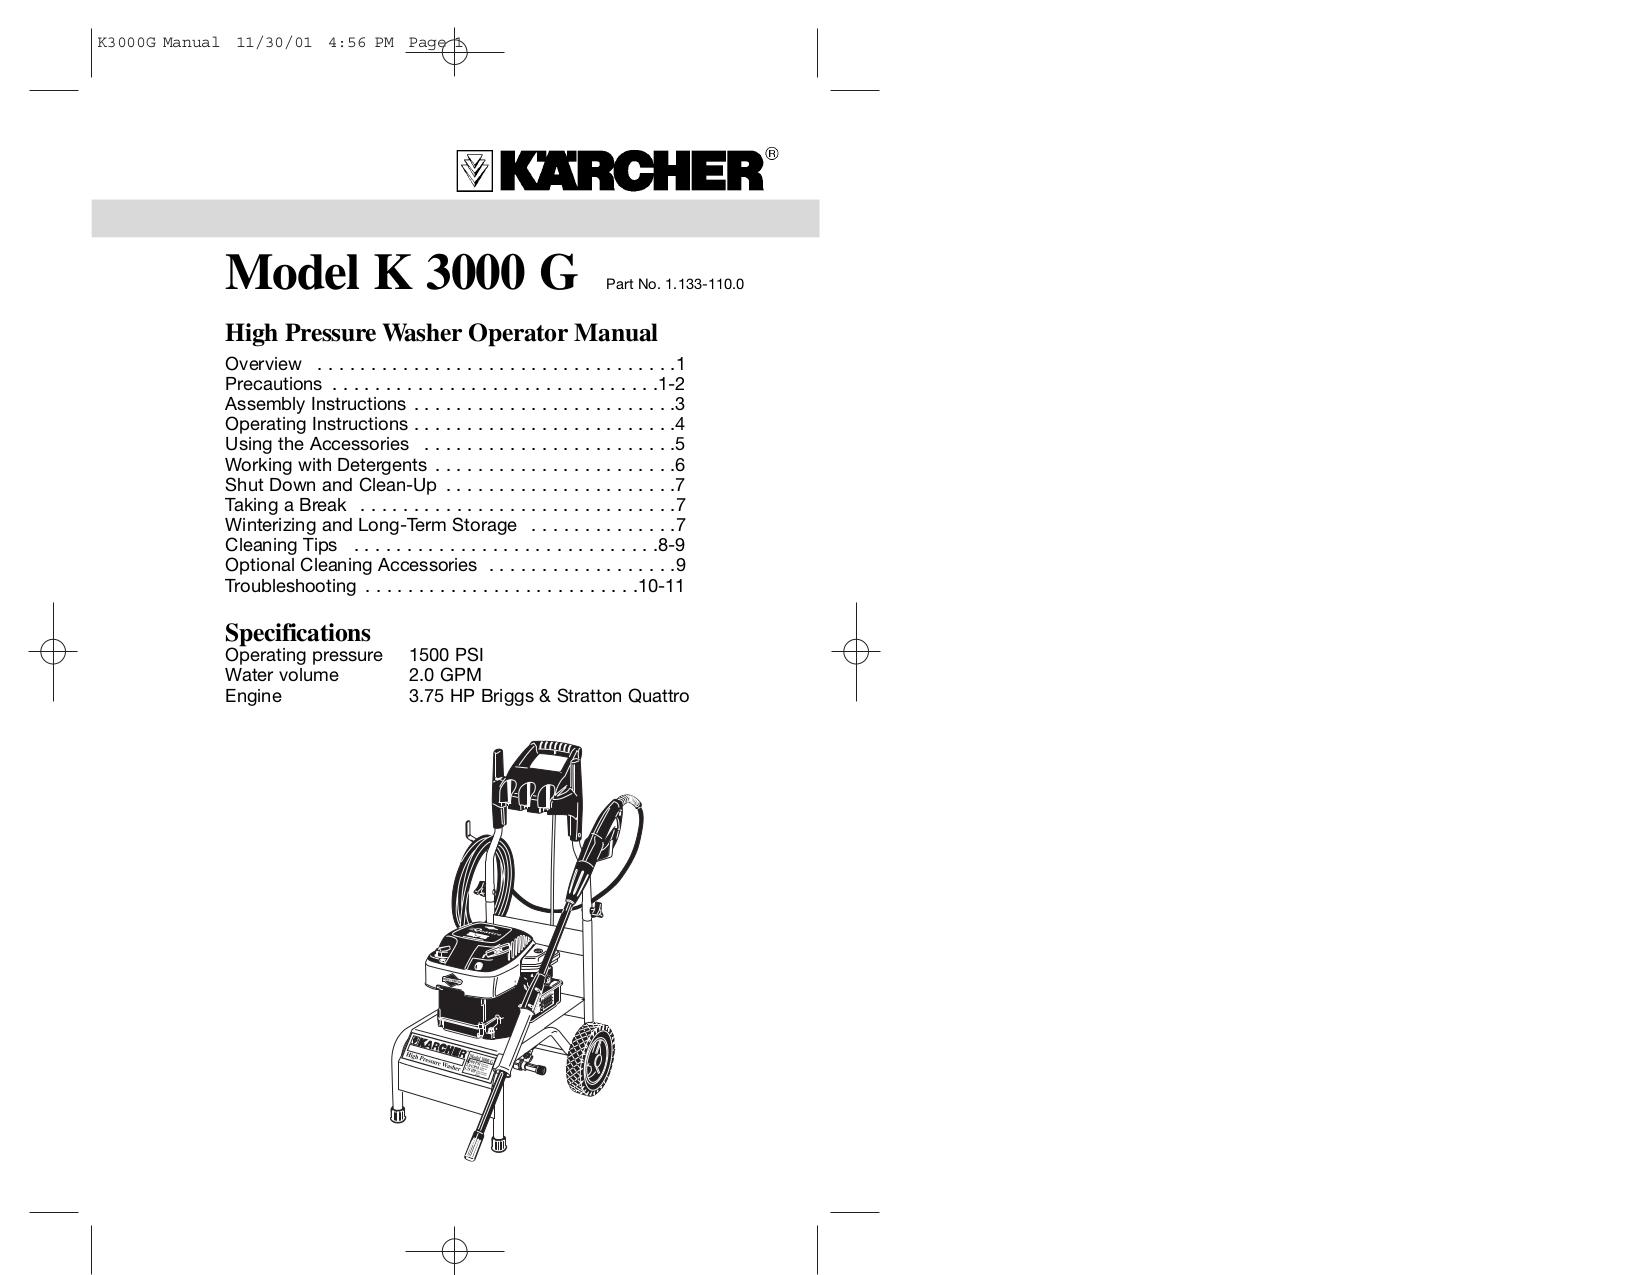 G Force Pressure Cleaner Manual